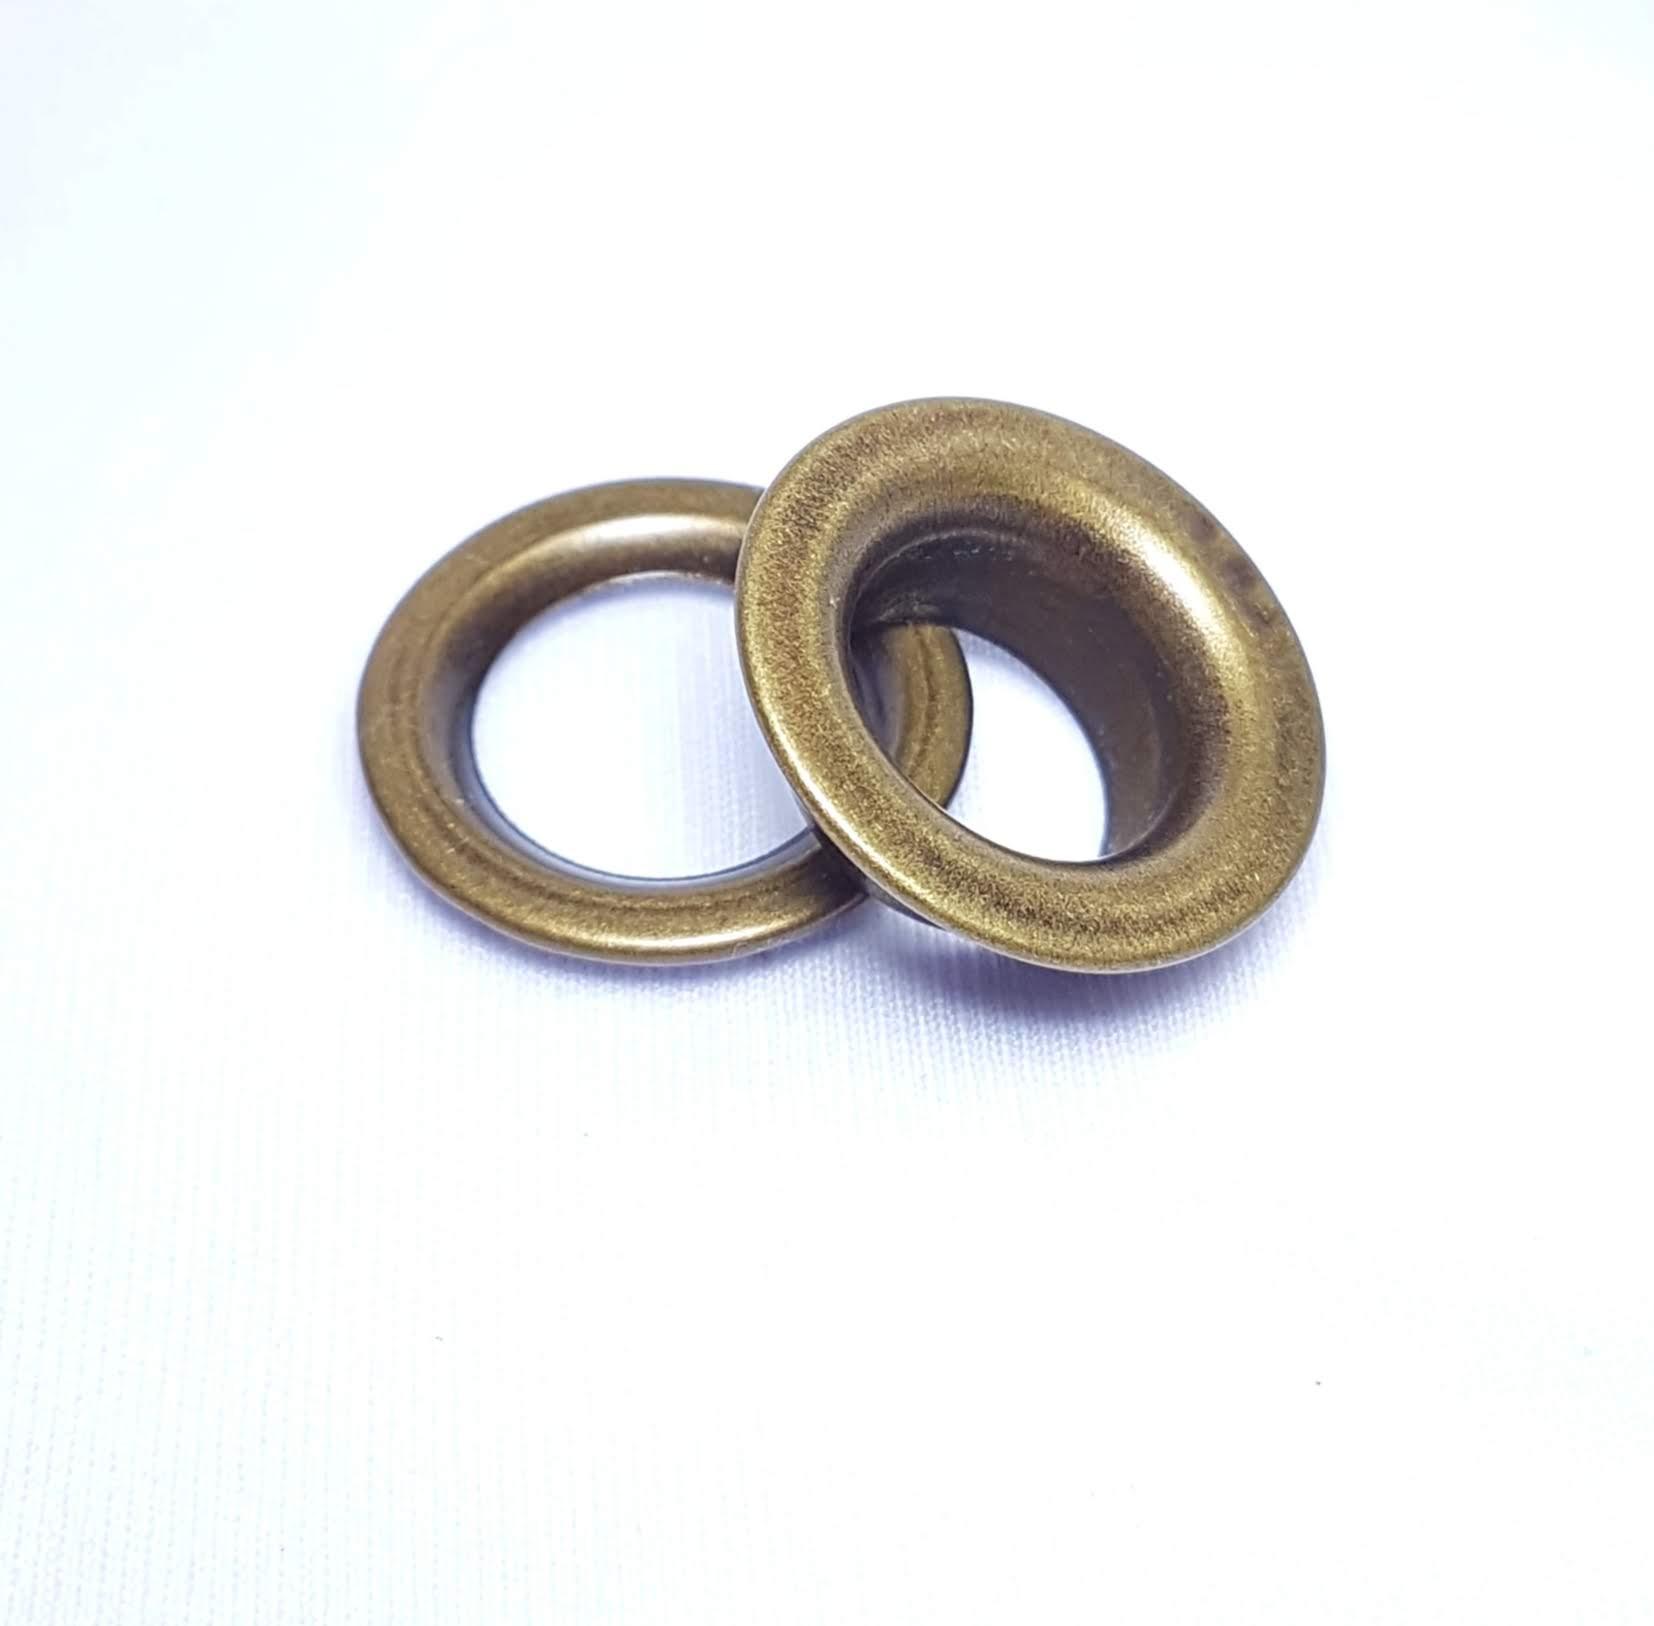 Ilhós de ferro arruela com garra n.º 3 - Ouro Velho - Pcte c/ 10 unid